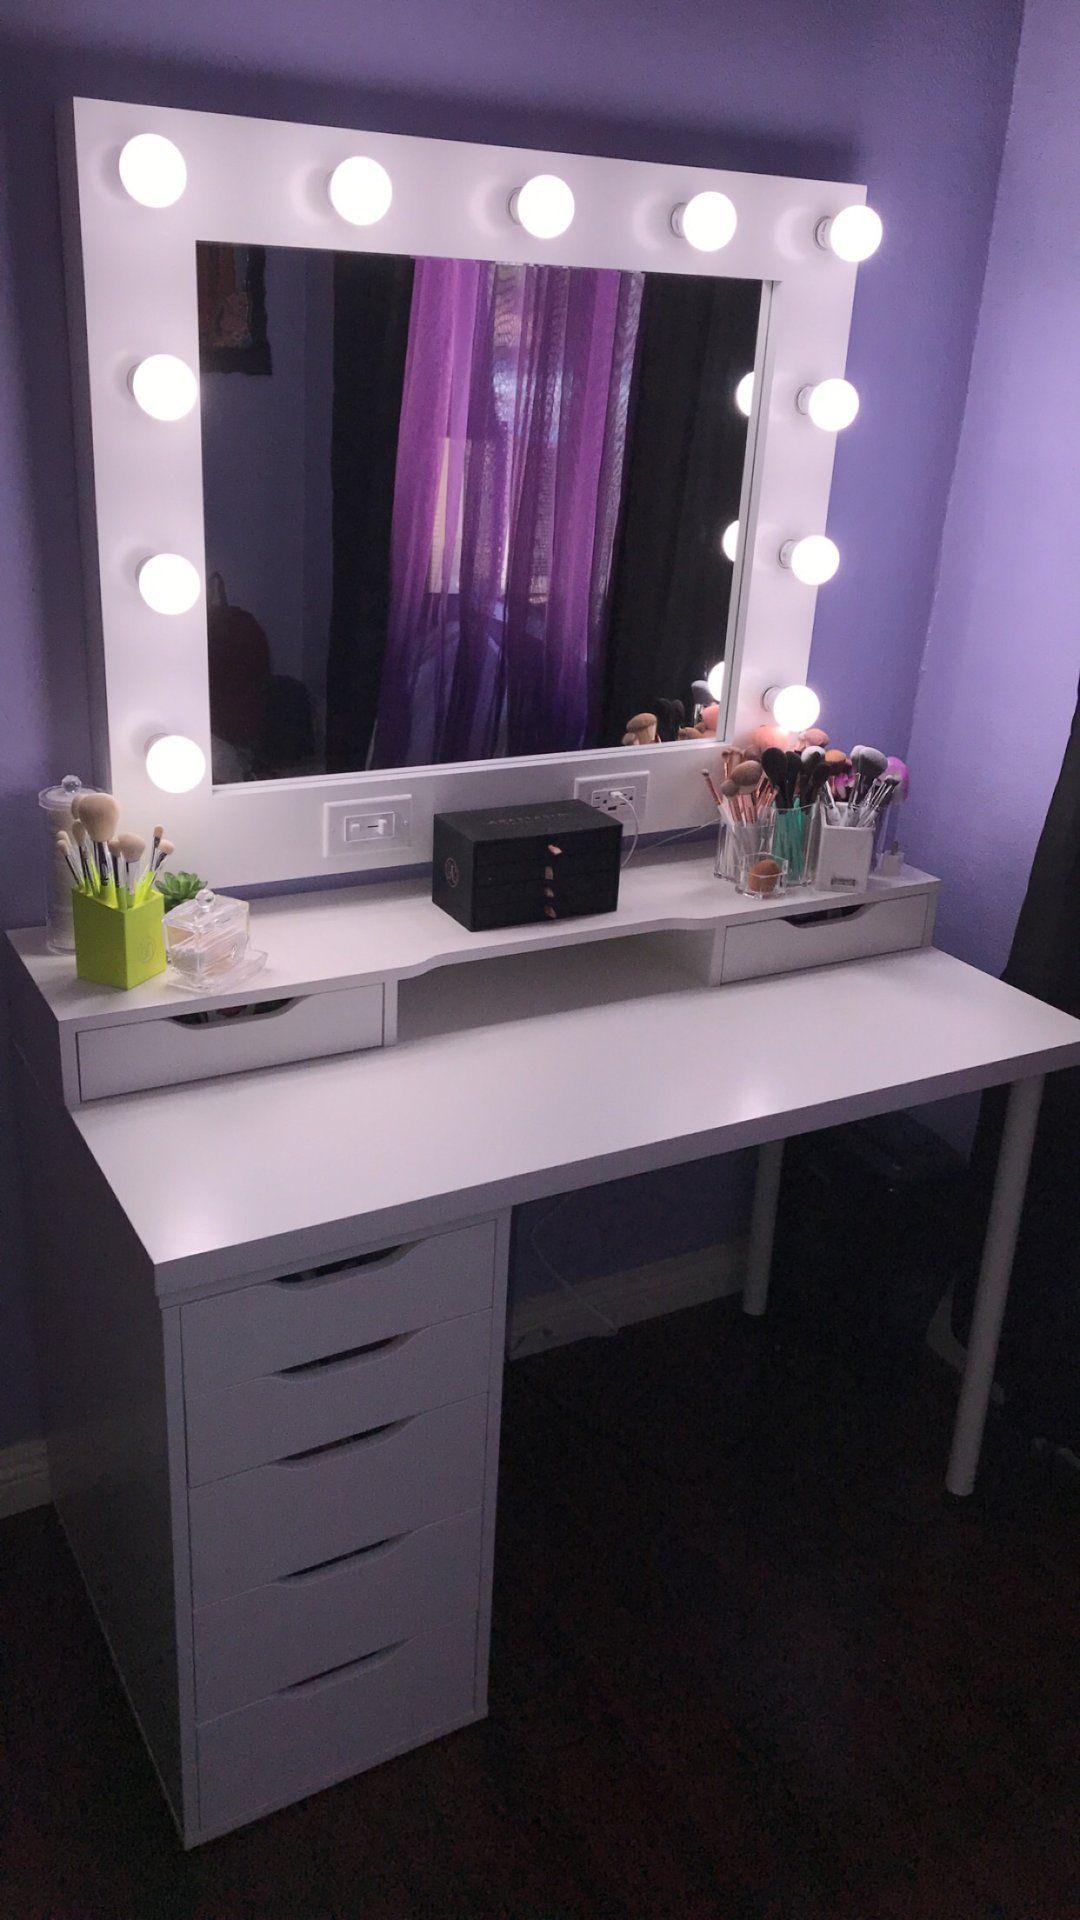 Small Dream Vanity Horizontal Buy Dream Vanities Stylish Bedroom Beauty Room Vanity Room Ideas Bedroom